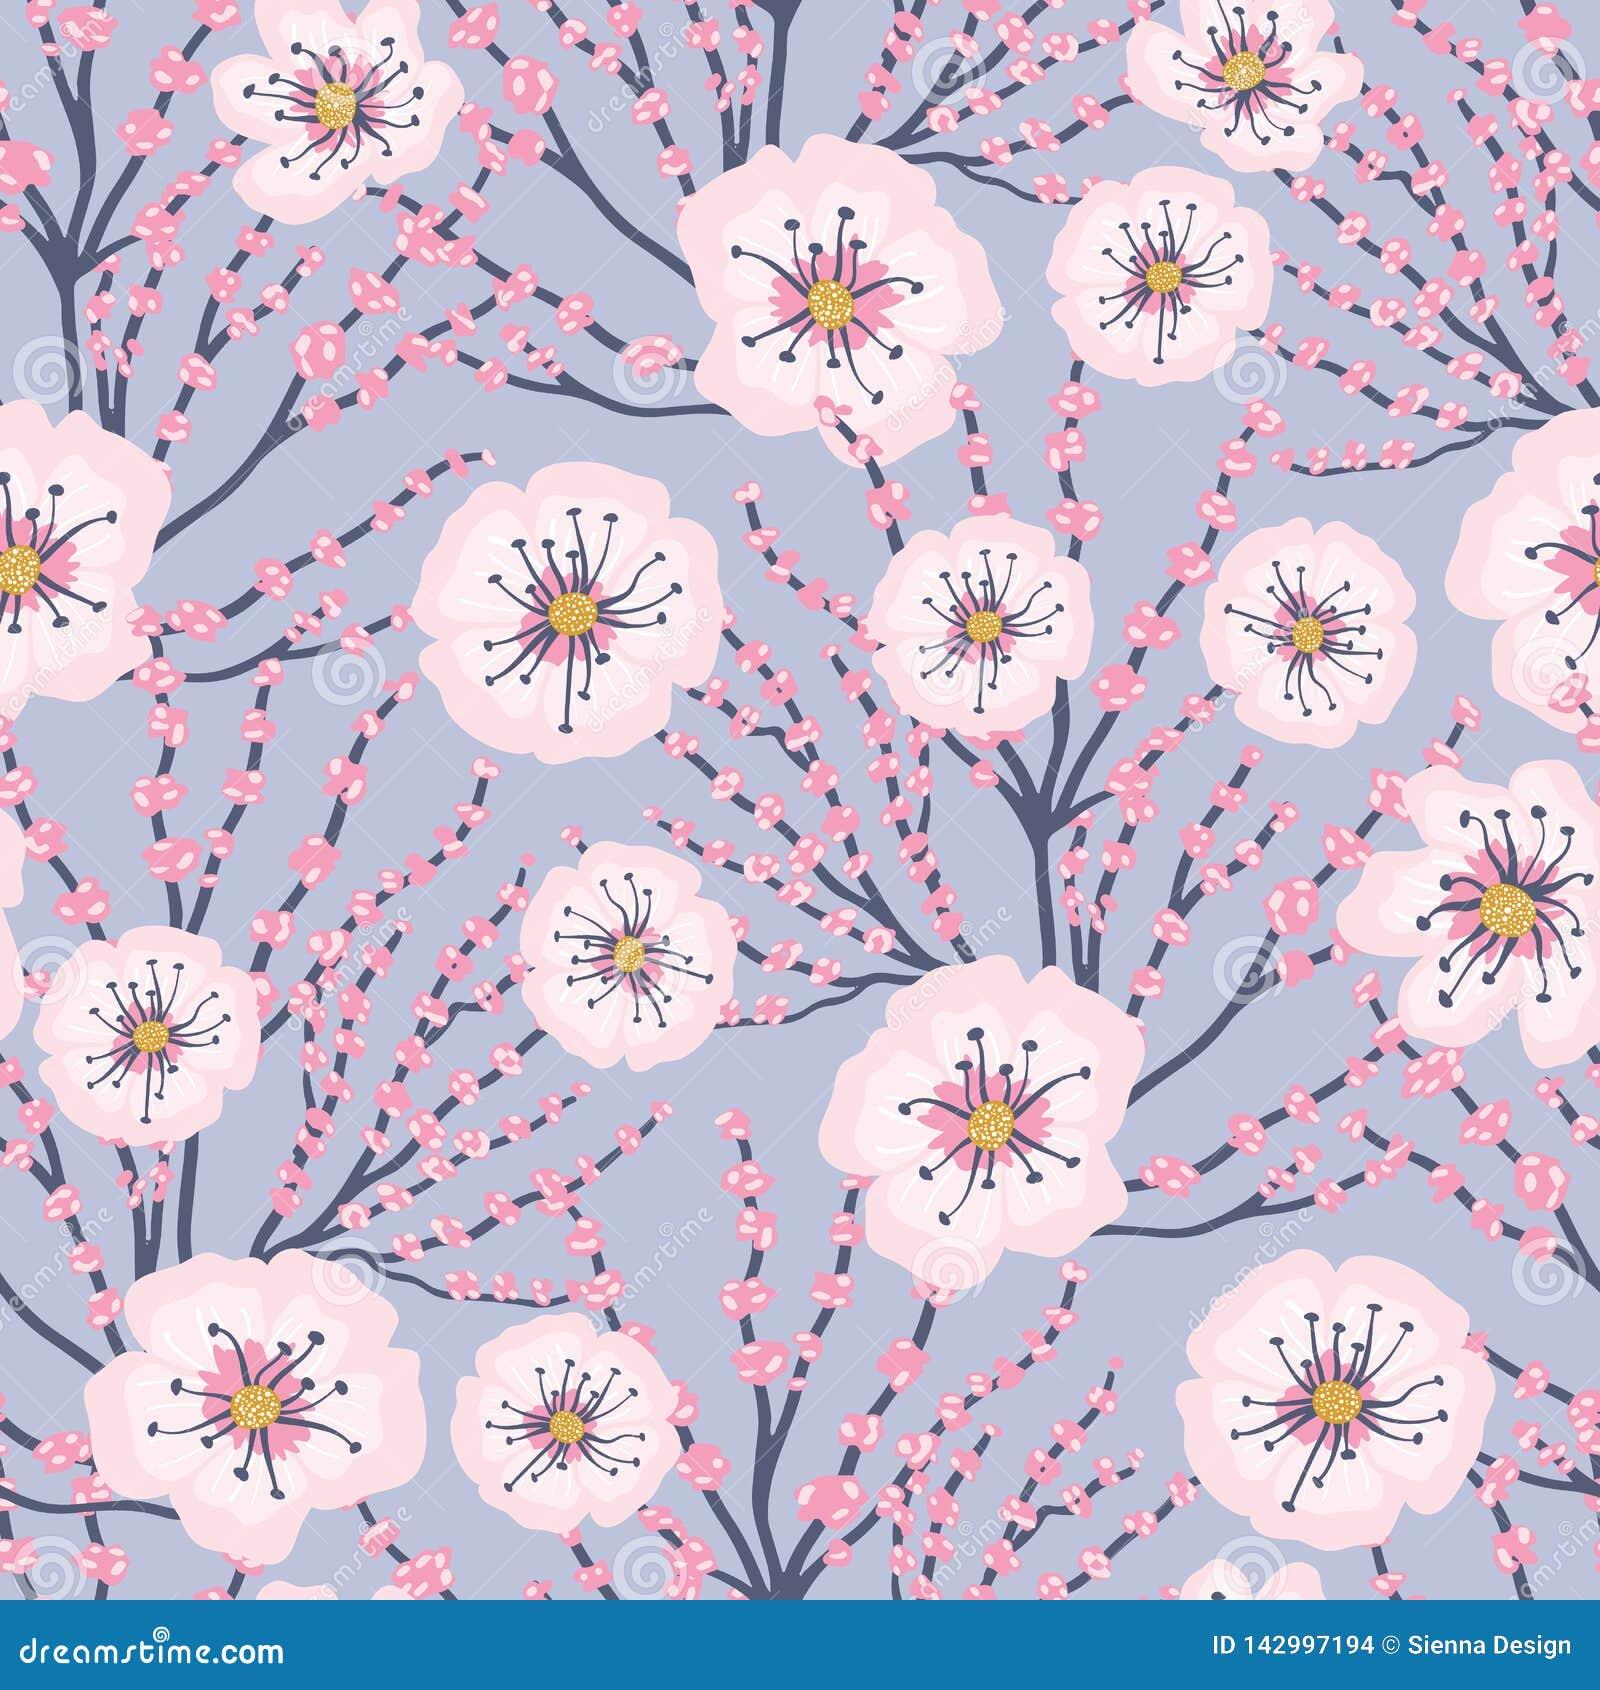 Vector Roze Bloemen Blauwe Achtergrond Cherry Blossom Meadows Seamless Pattern